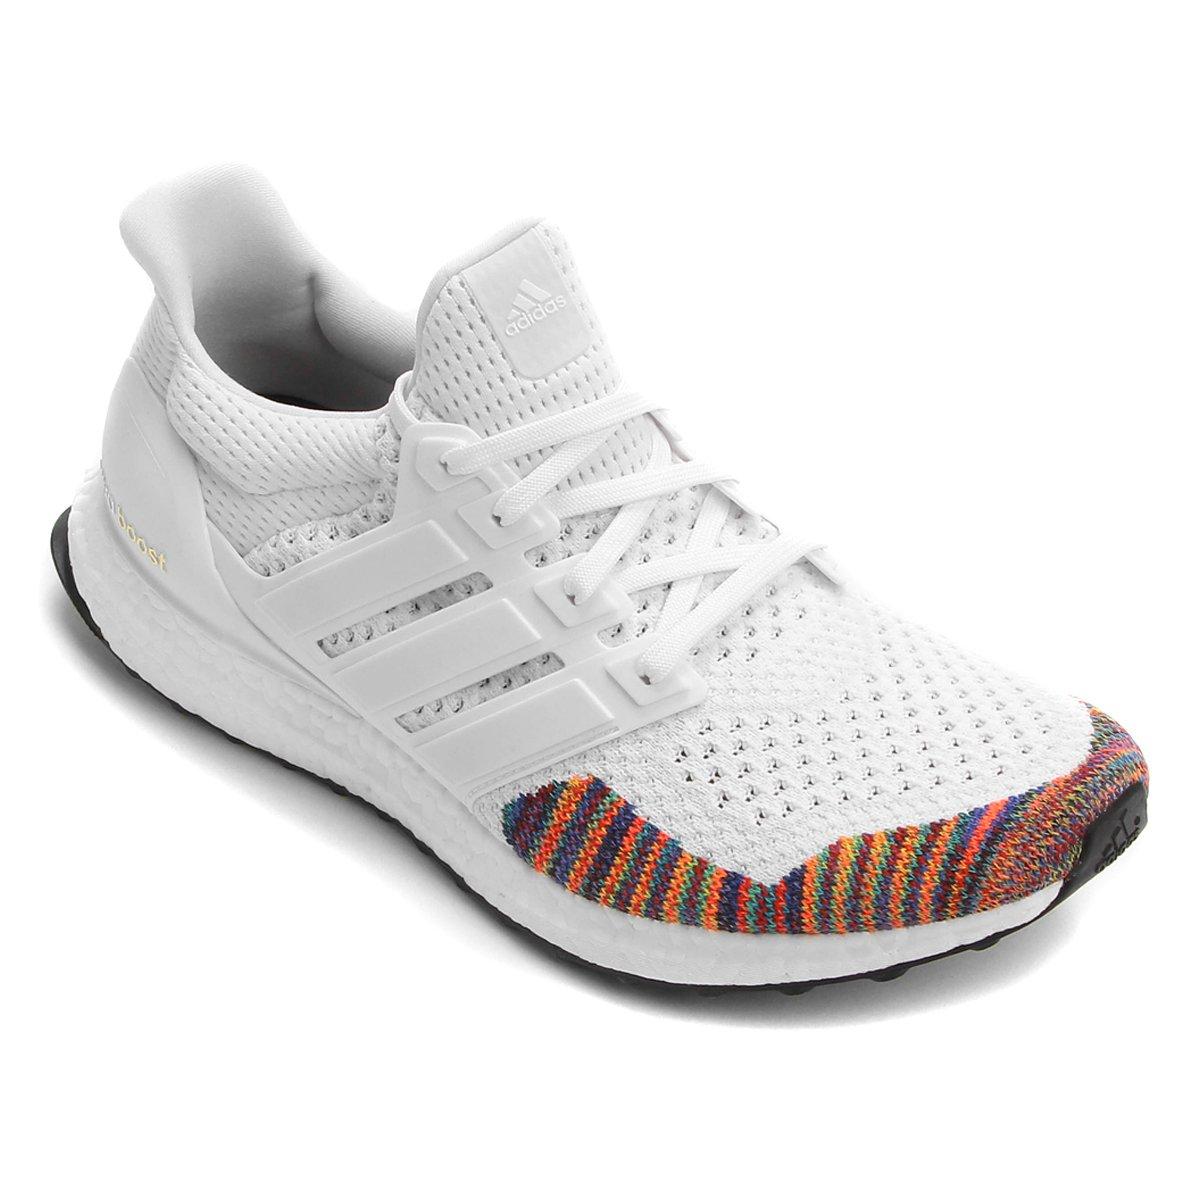 6e84dfbff6 Tênis Adidas Ultra Boost Ltd - Compre Agora